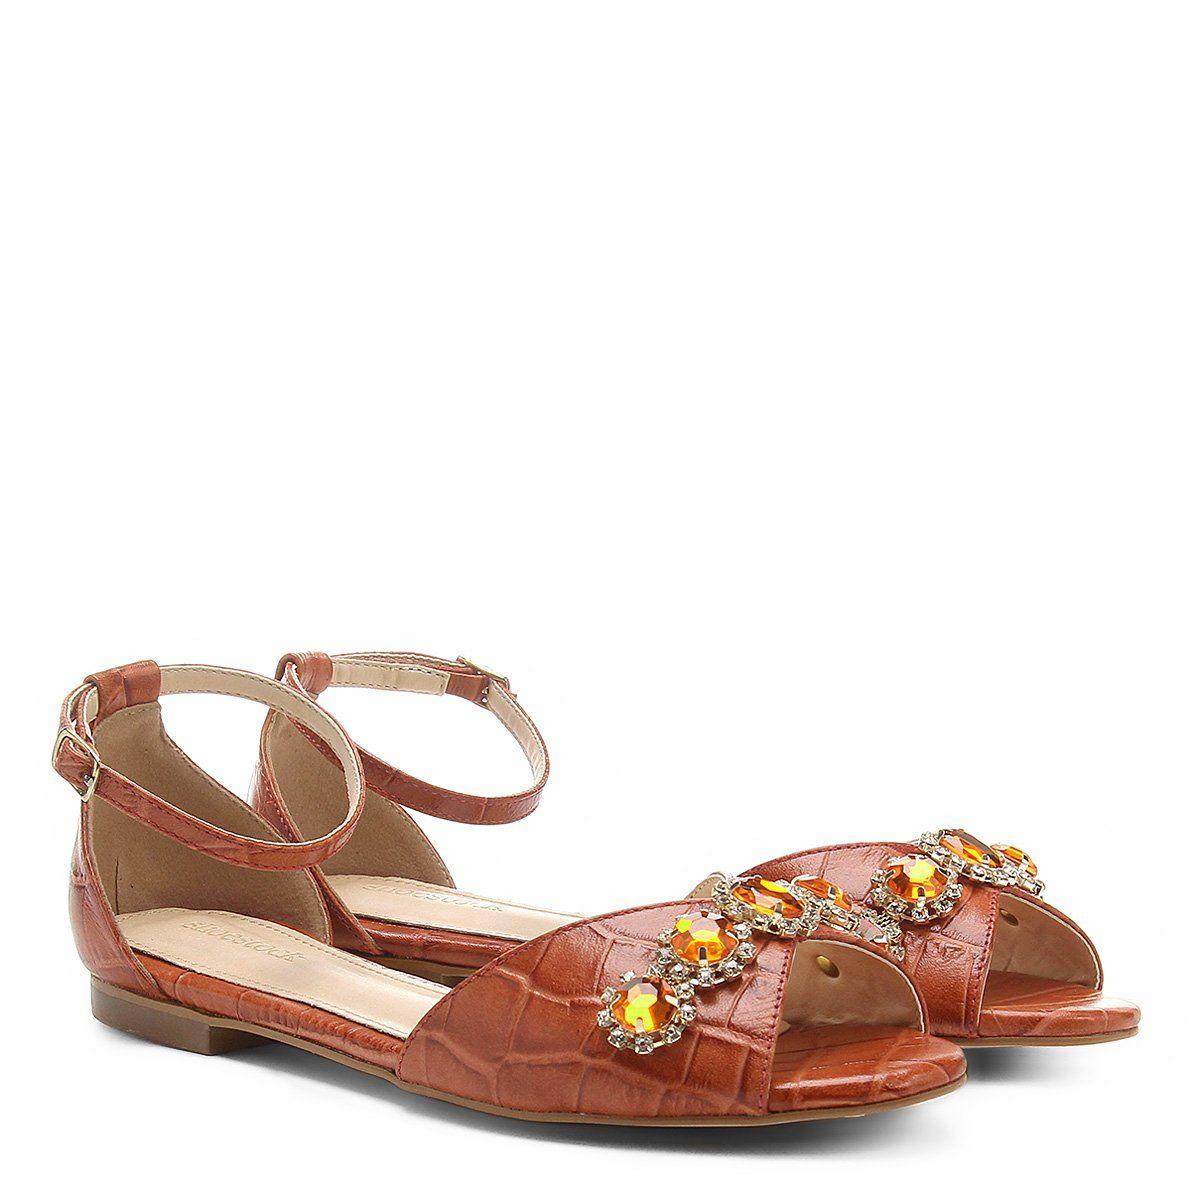 62953ea529 Rasteira Couro Shoestock Croco Feminina - Laranja